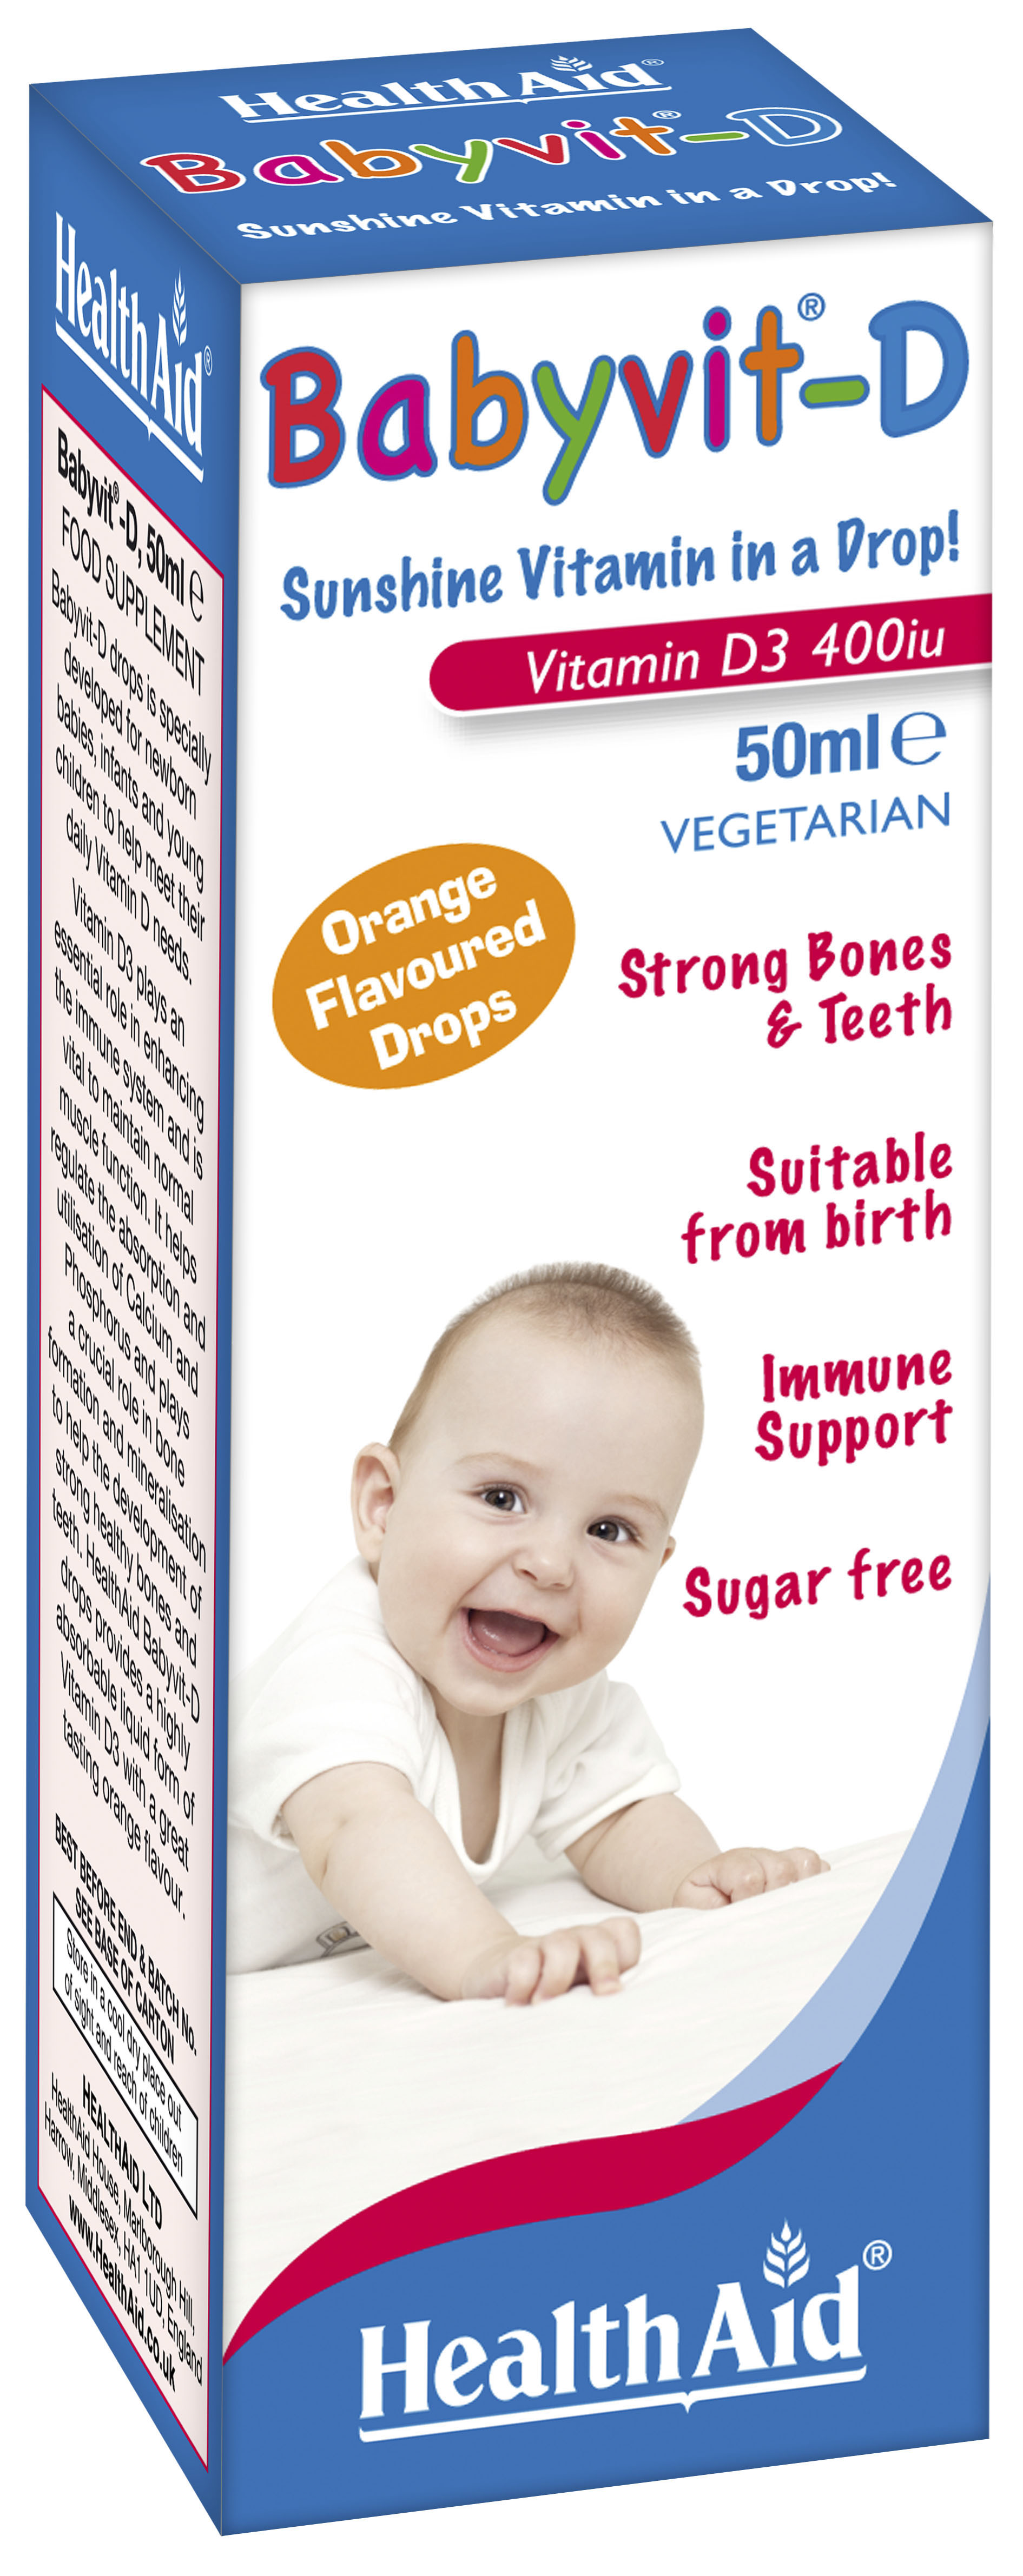 Babyvit-D Vitamin D 400iu 50ml